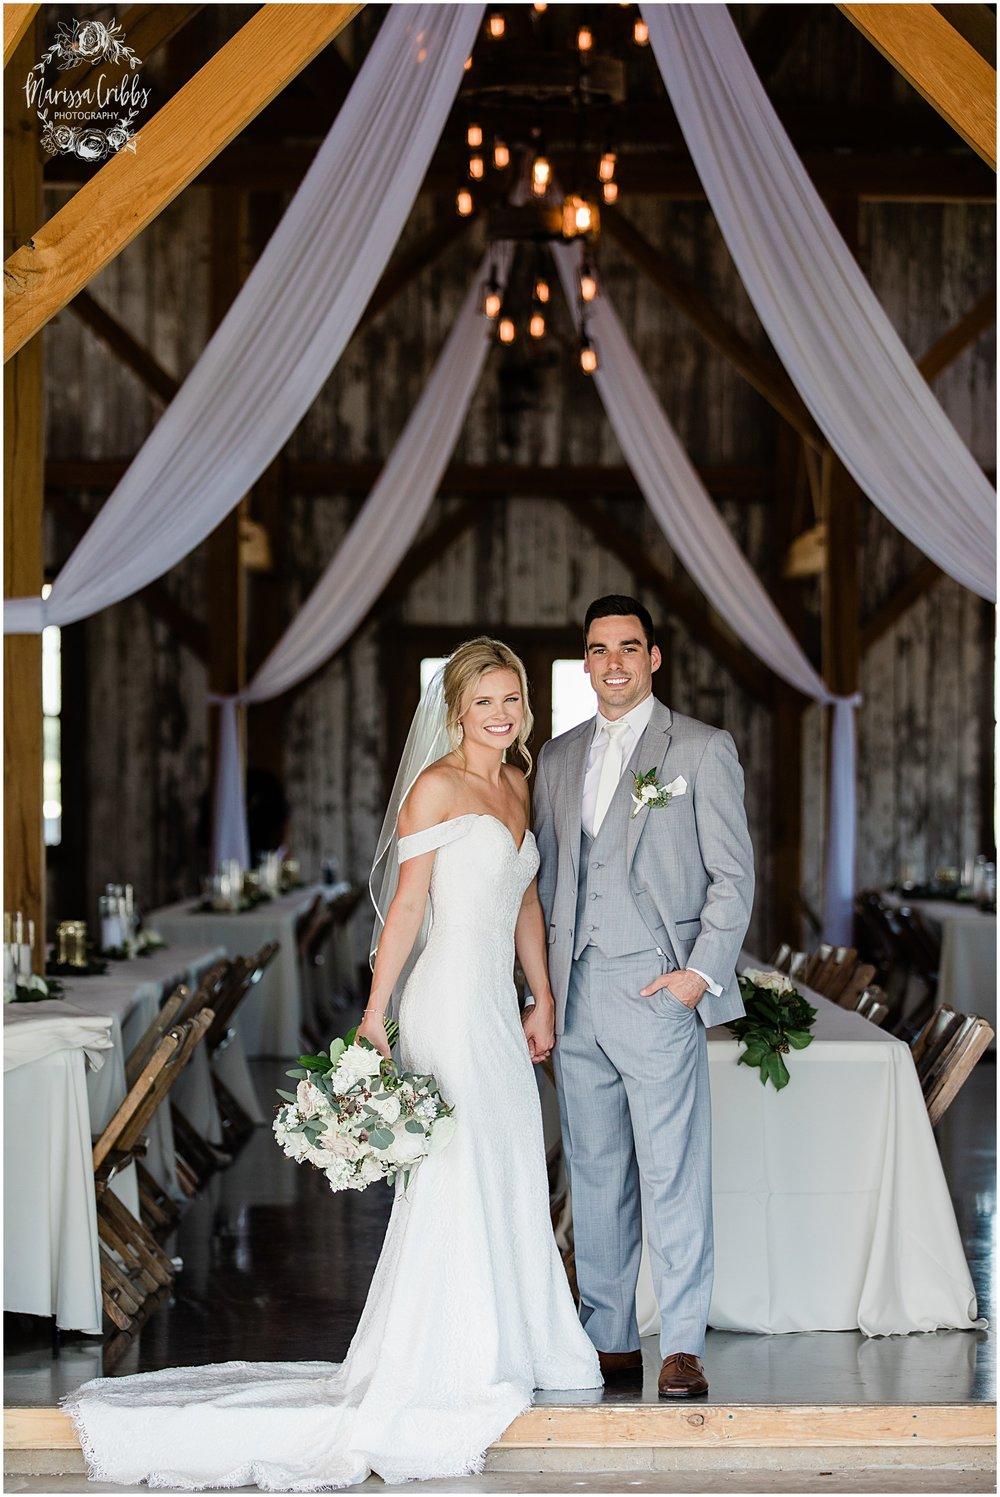 RHODES WEDDING | WESTON RED BARN FARM | MARISSA CRIBBS PHOTOGRAPHY_5243.jpg